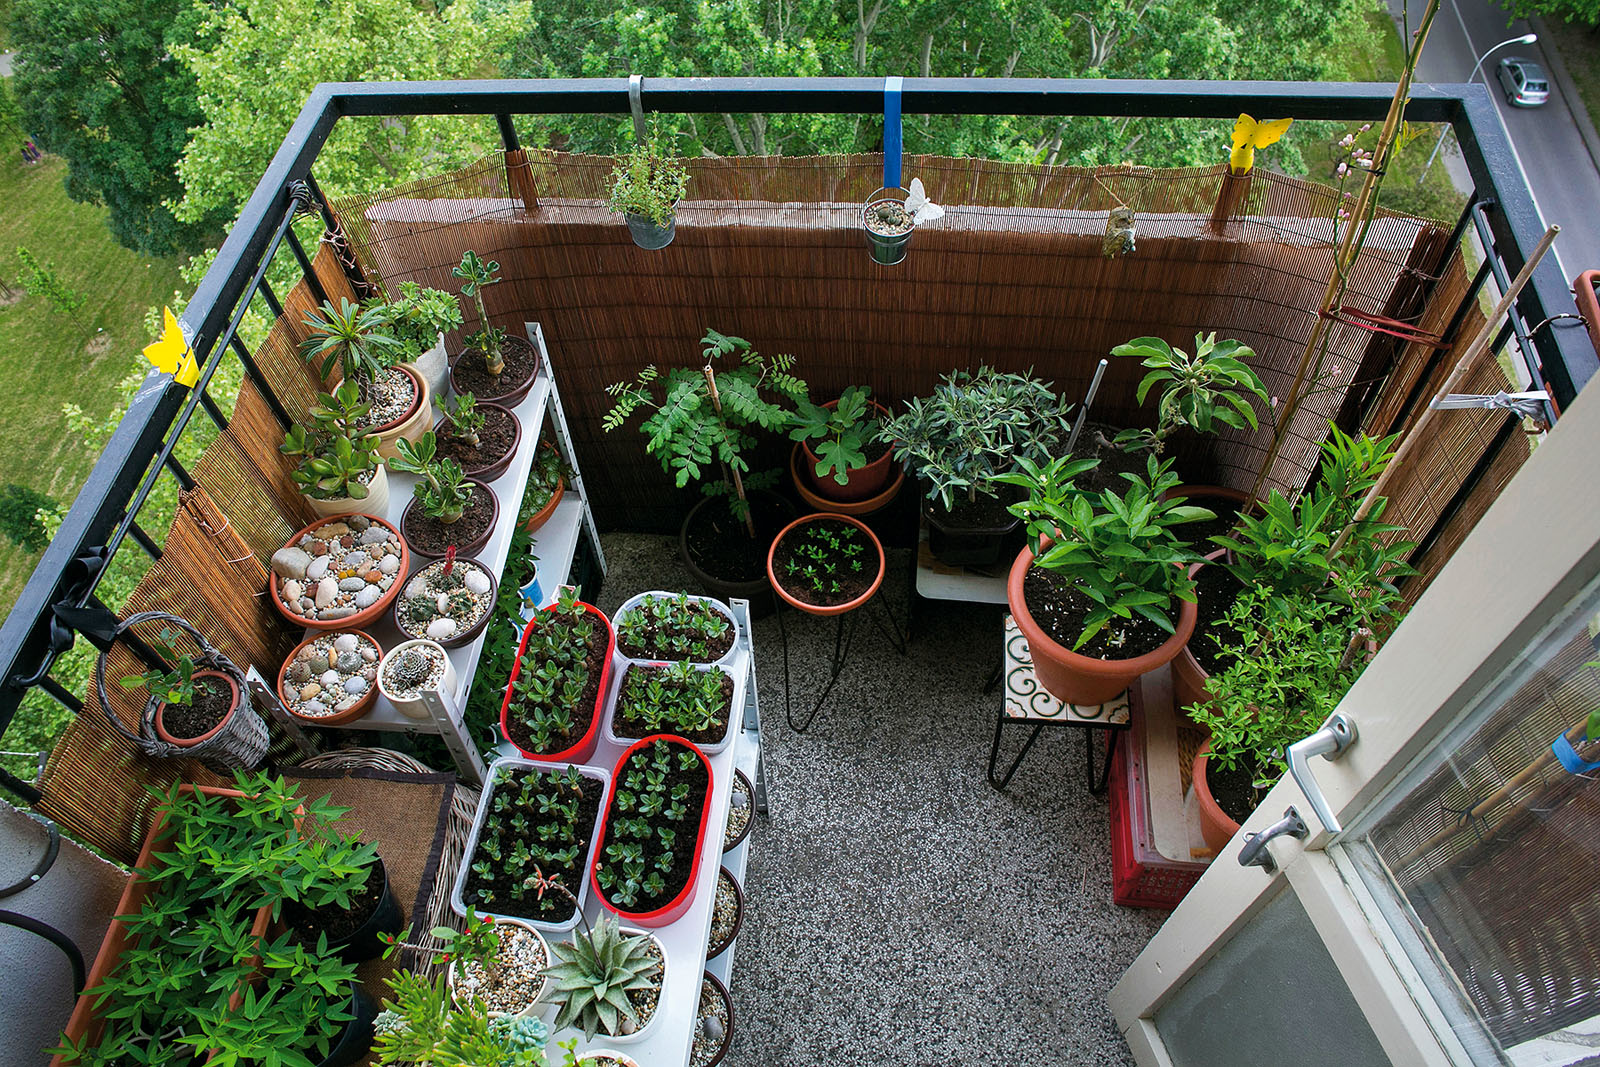 Zagreb, 120515. Mali balkon obitelji Pavlovic u Sigetu na kojem vlasnica uzgaja razne vrste vocki, bilja kaktusa i sukulenata. Foto: Berislava Picek / CROPIX